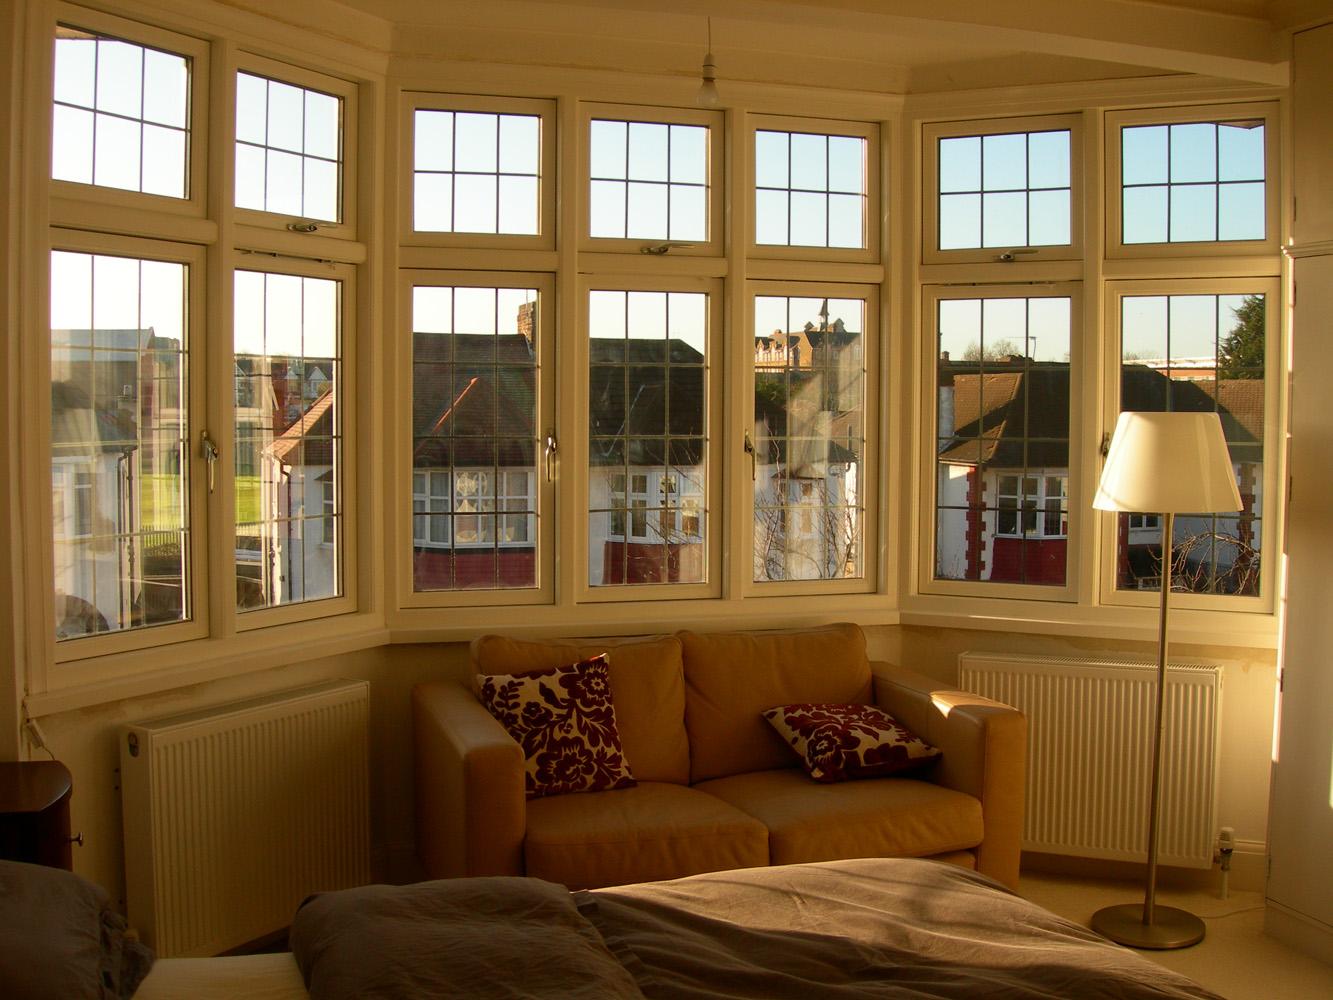 GLASS WINDOW DOOR DESIGN | Interior design ideas